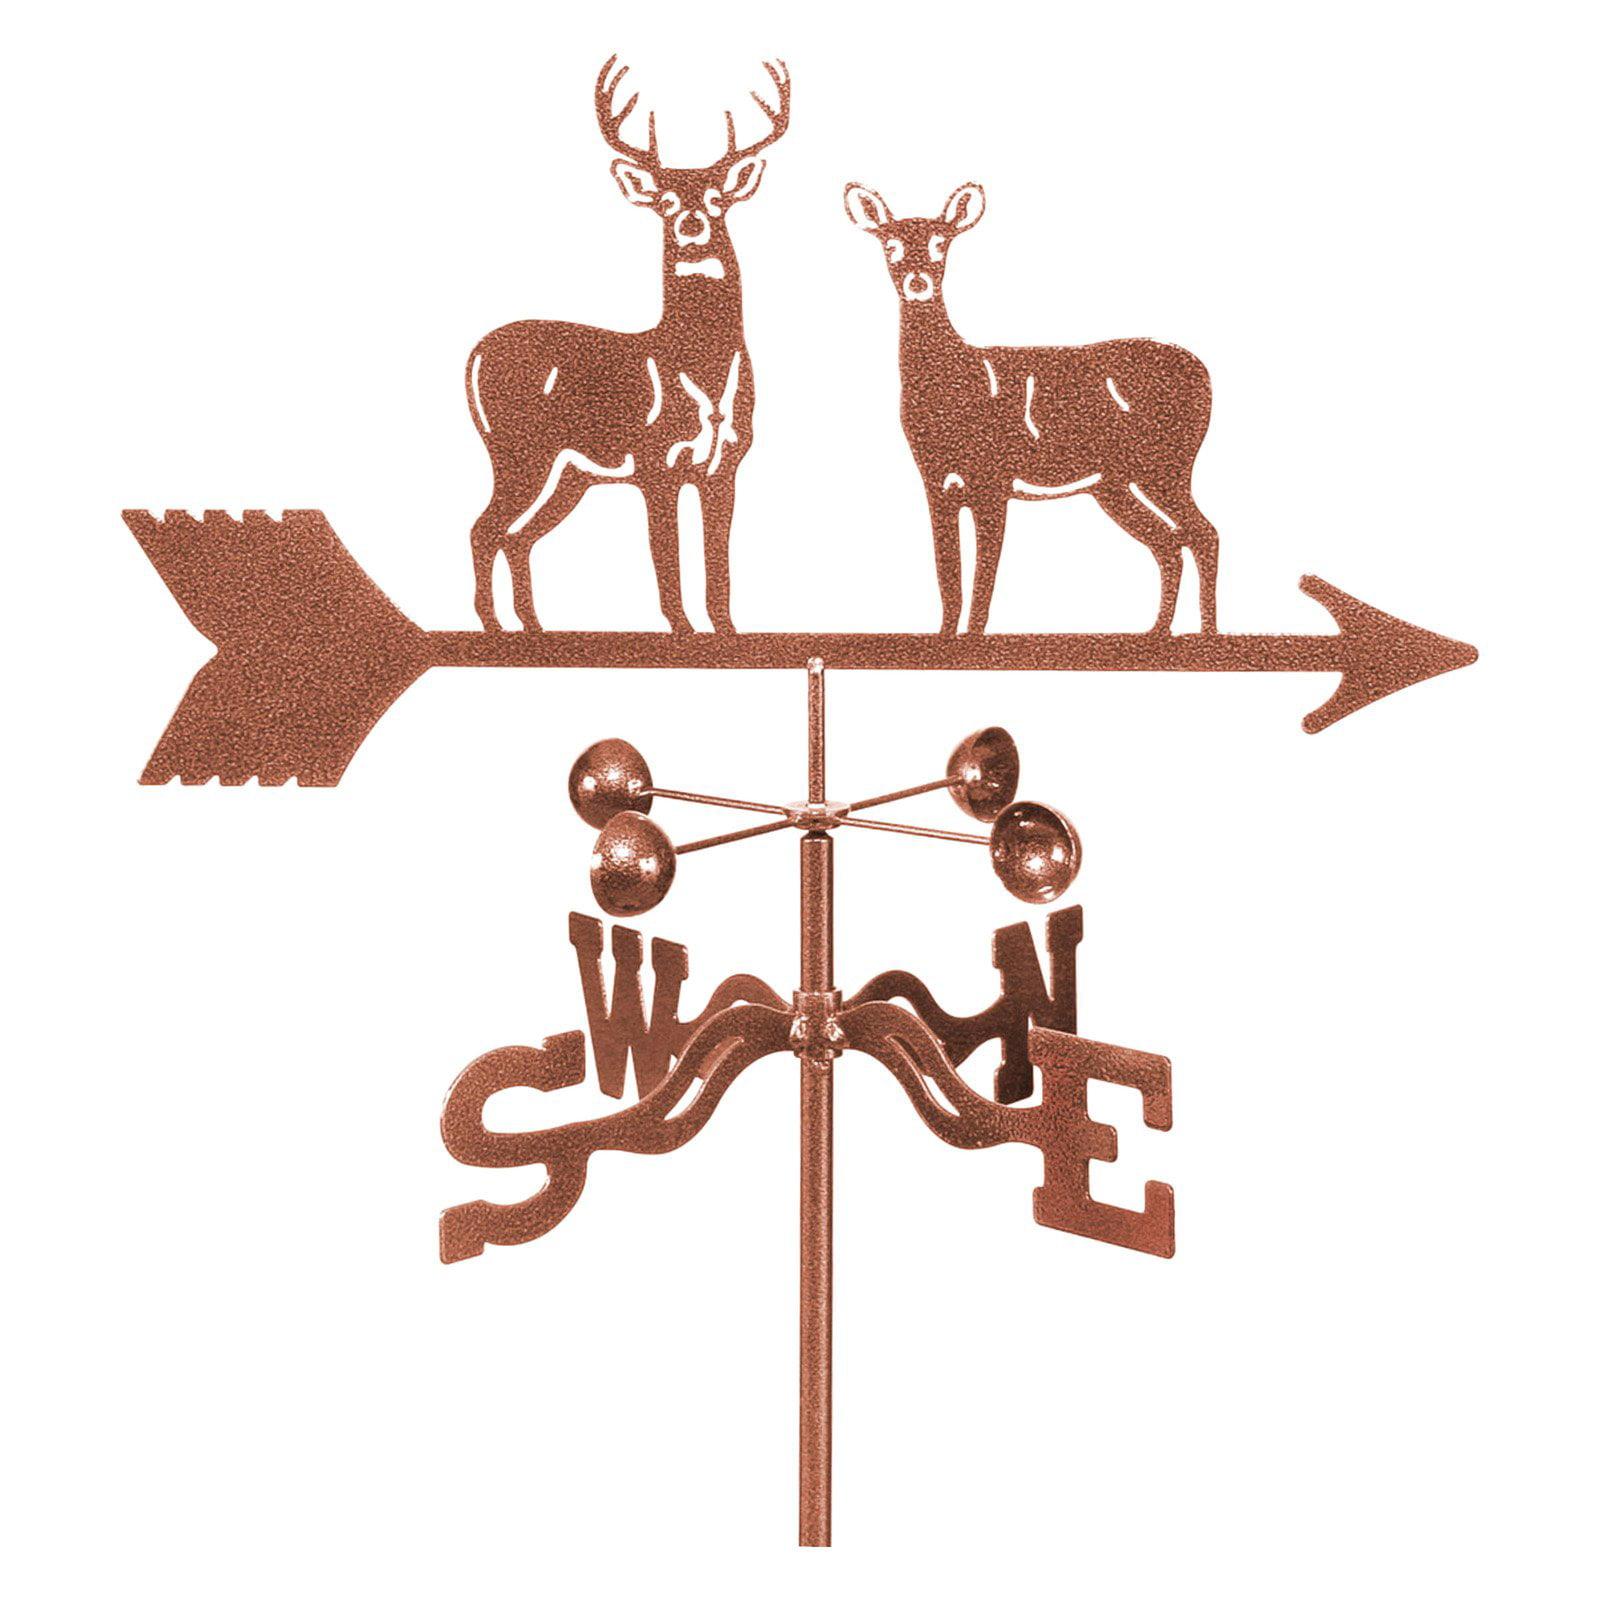 EZ Vane Standing Deer Weathervane by